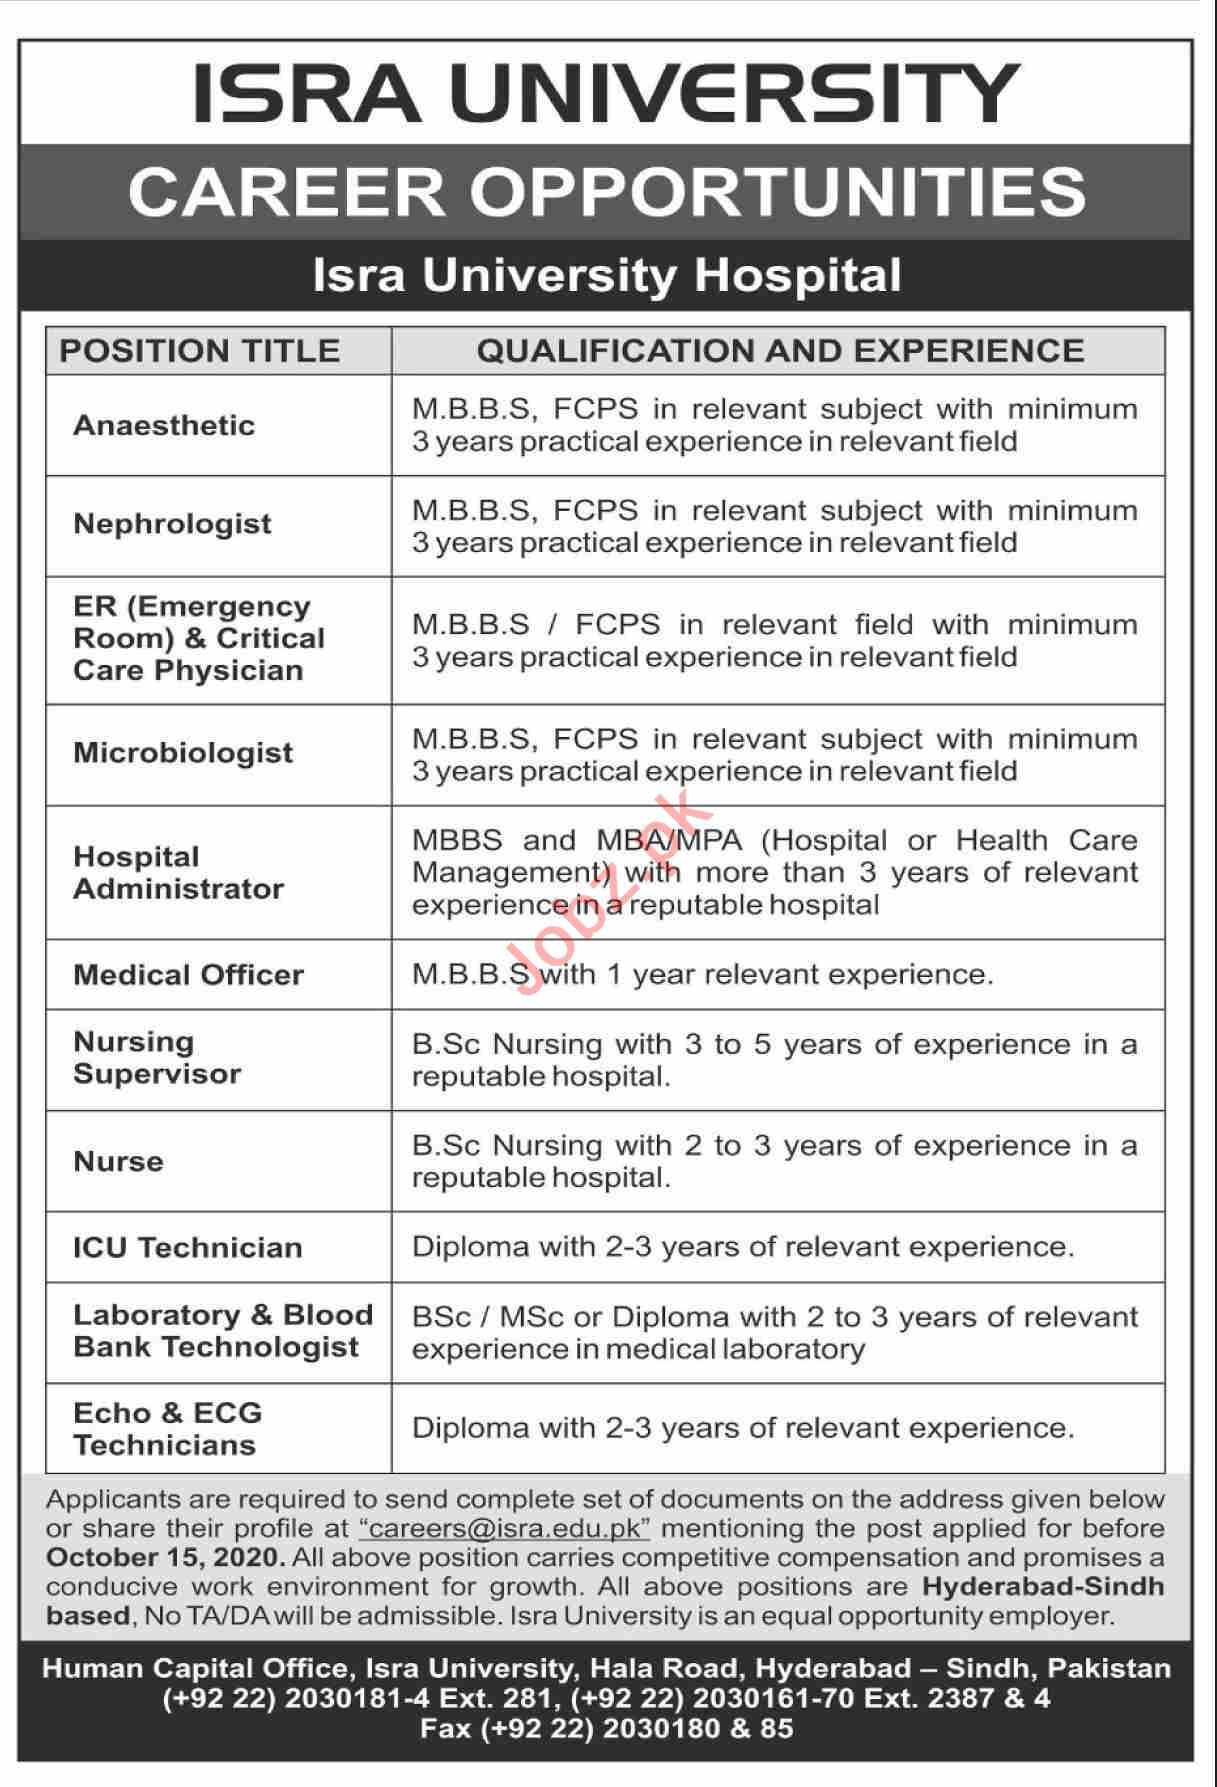 Isra University Hospital Hyderabad Jobs 2020 for Doctors